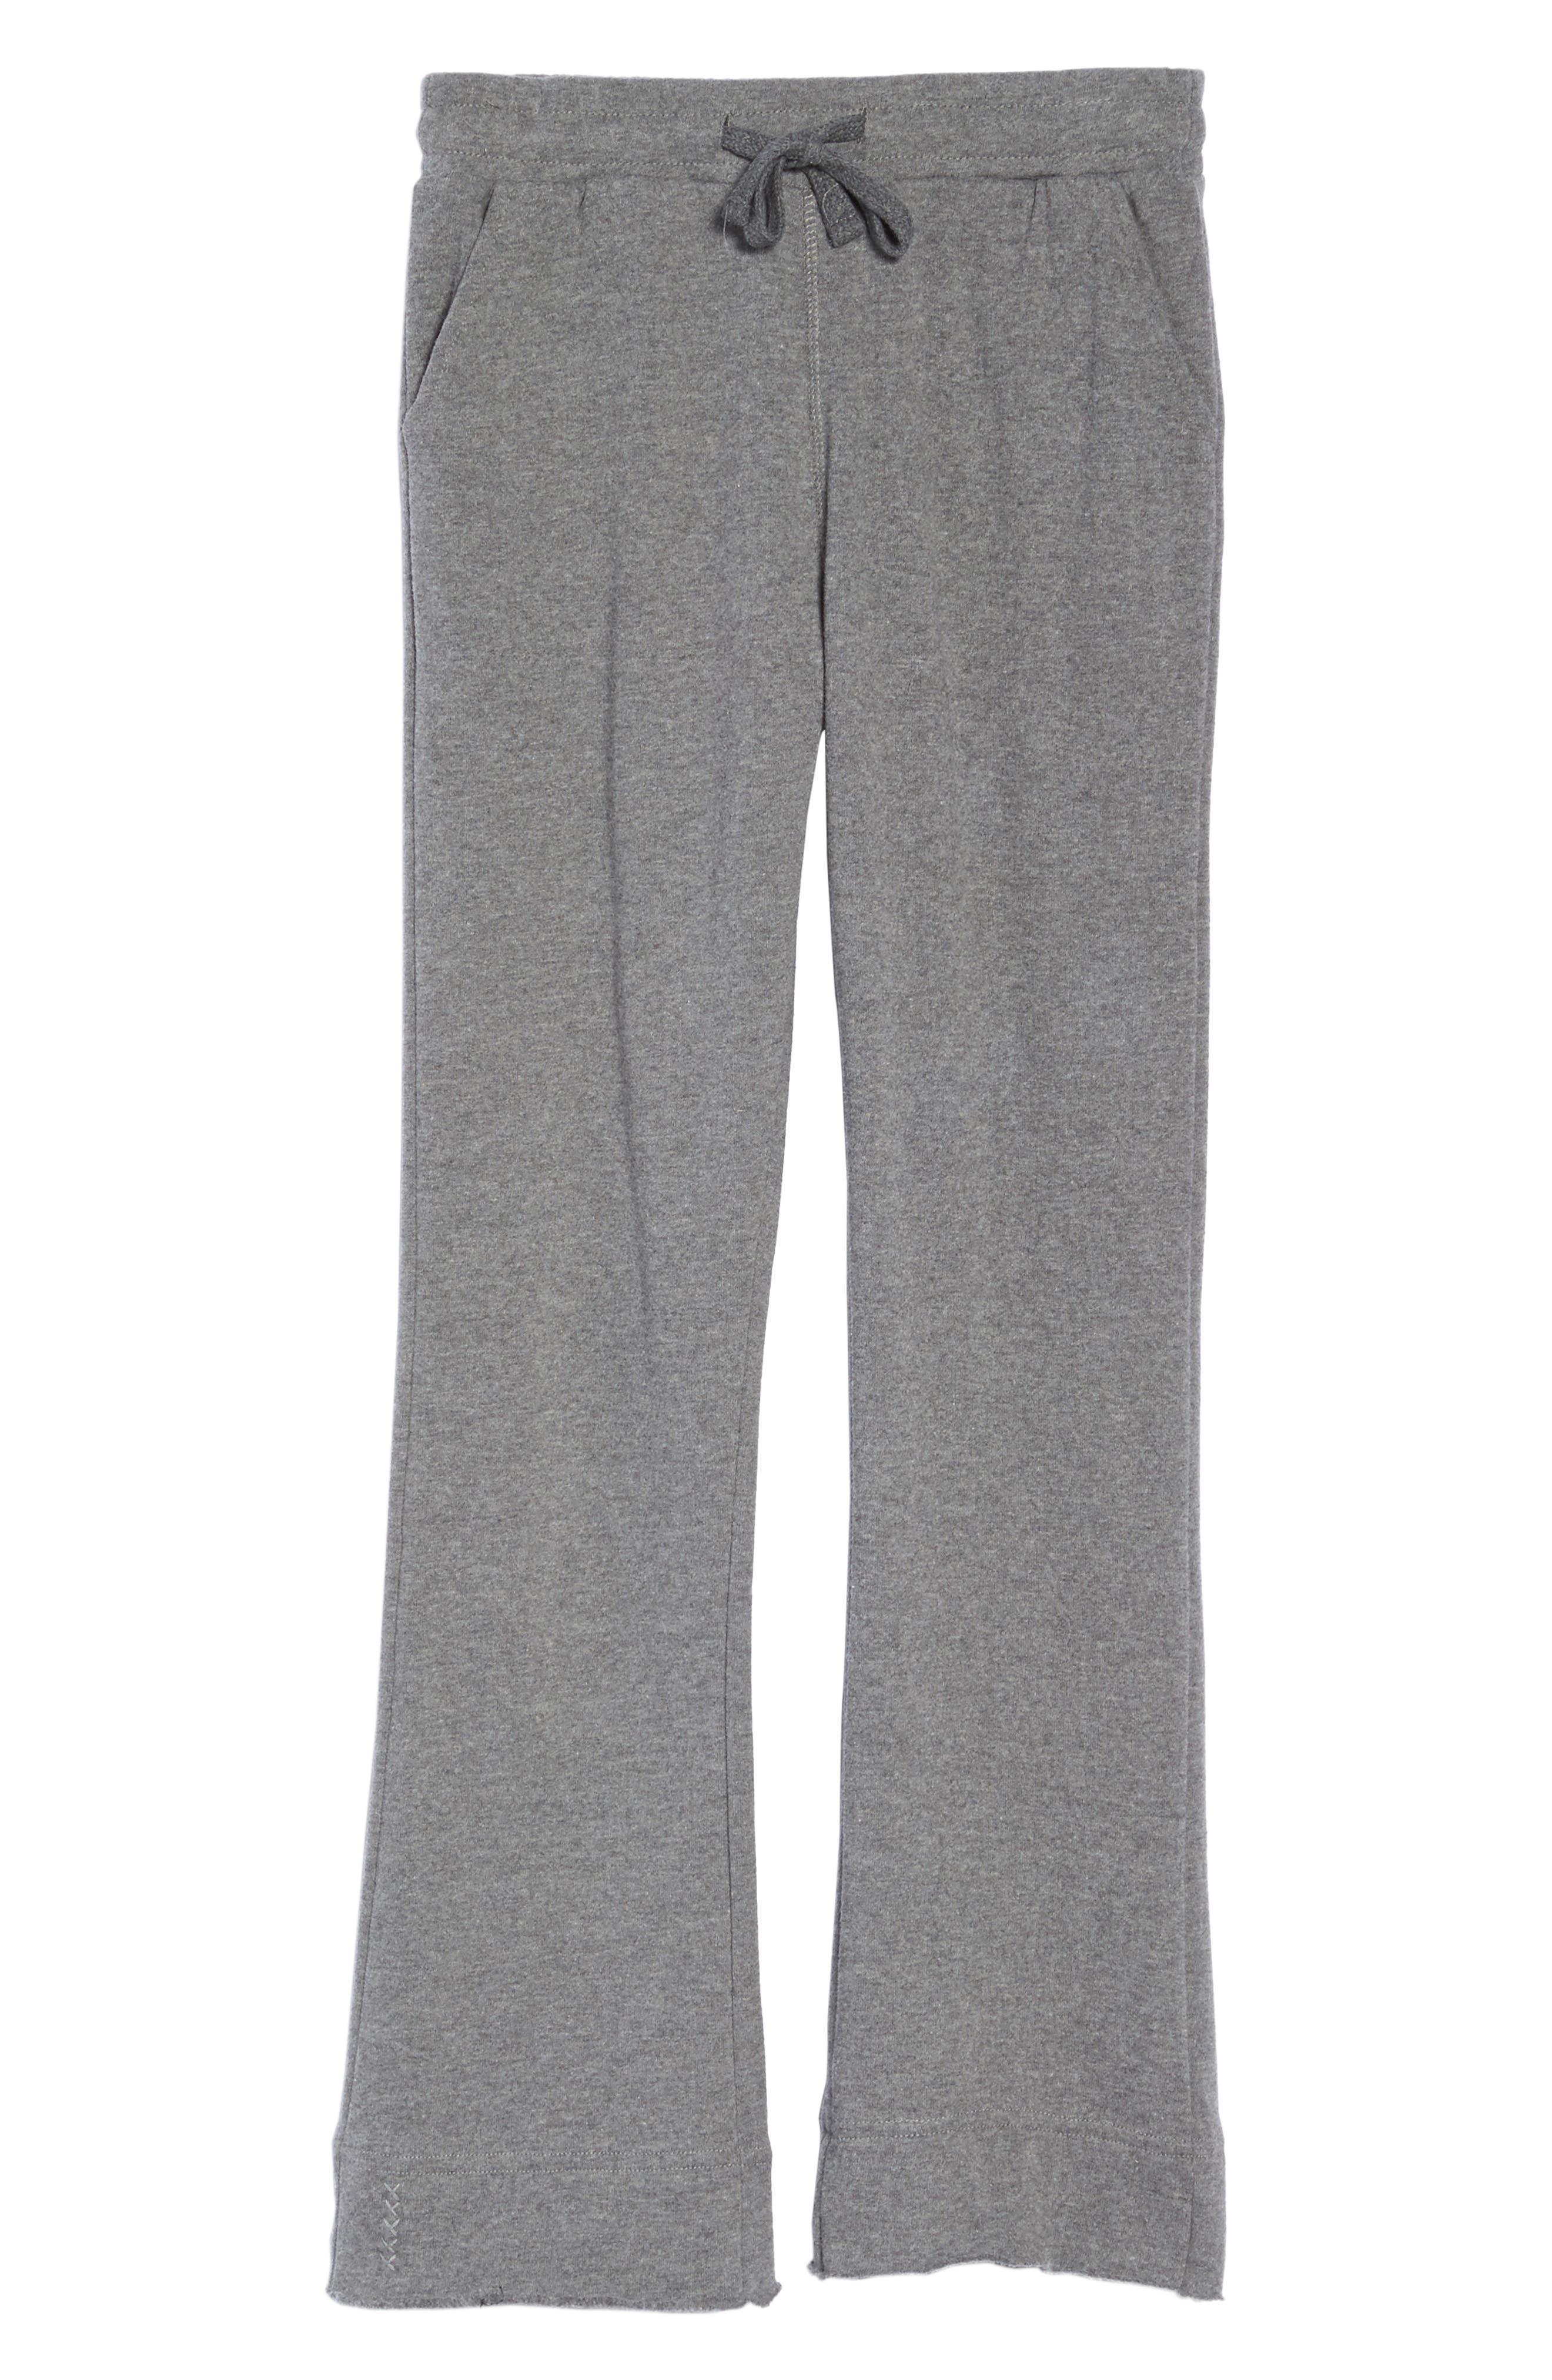 Crop Flare Sweatpants,                             Alternate thumbnail 6, color,                             020